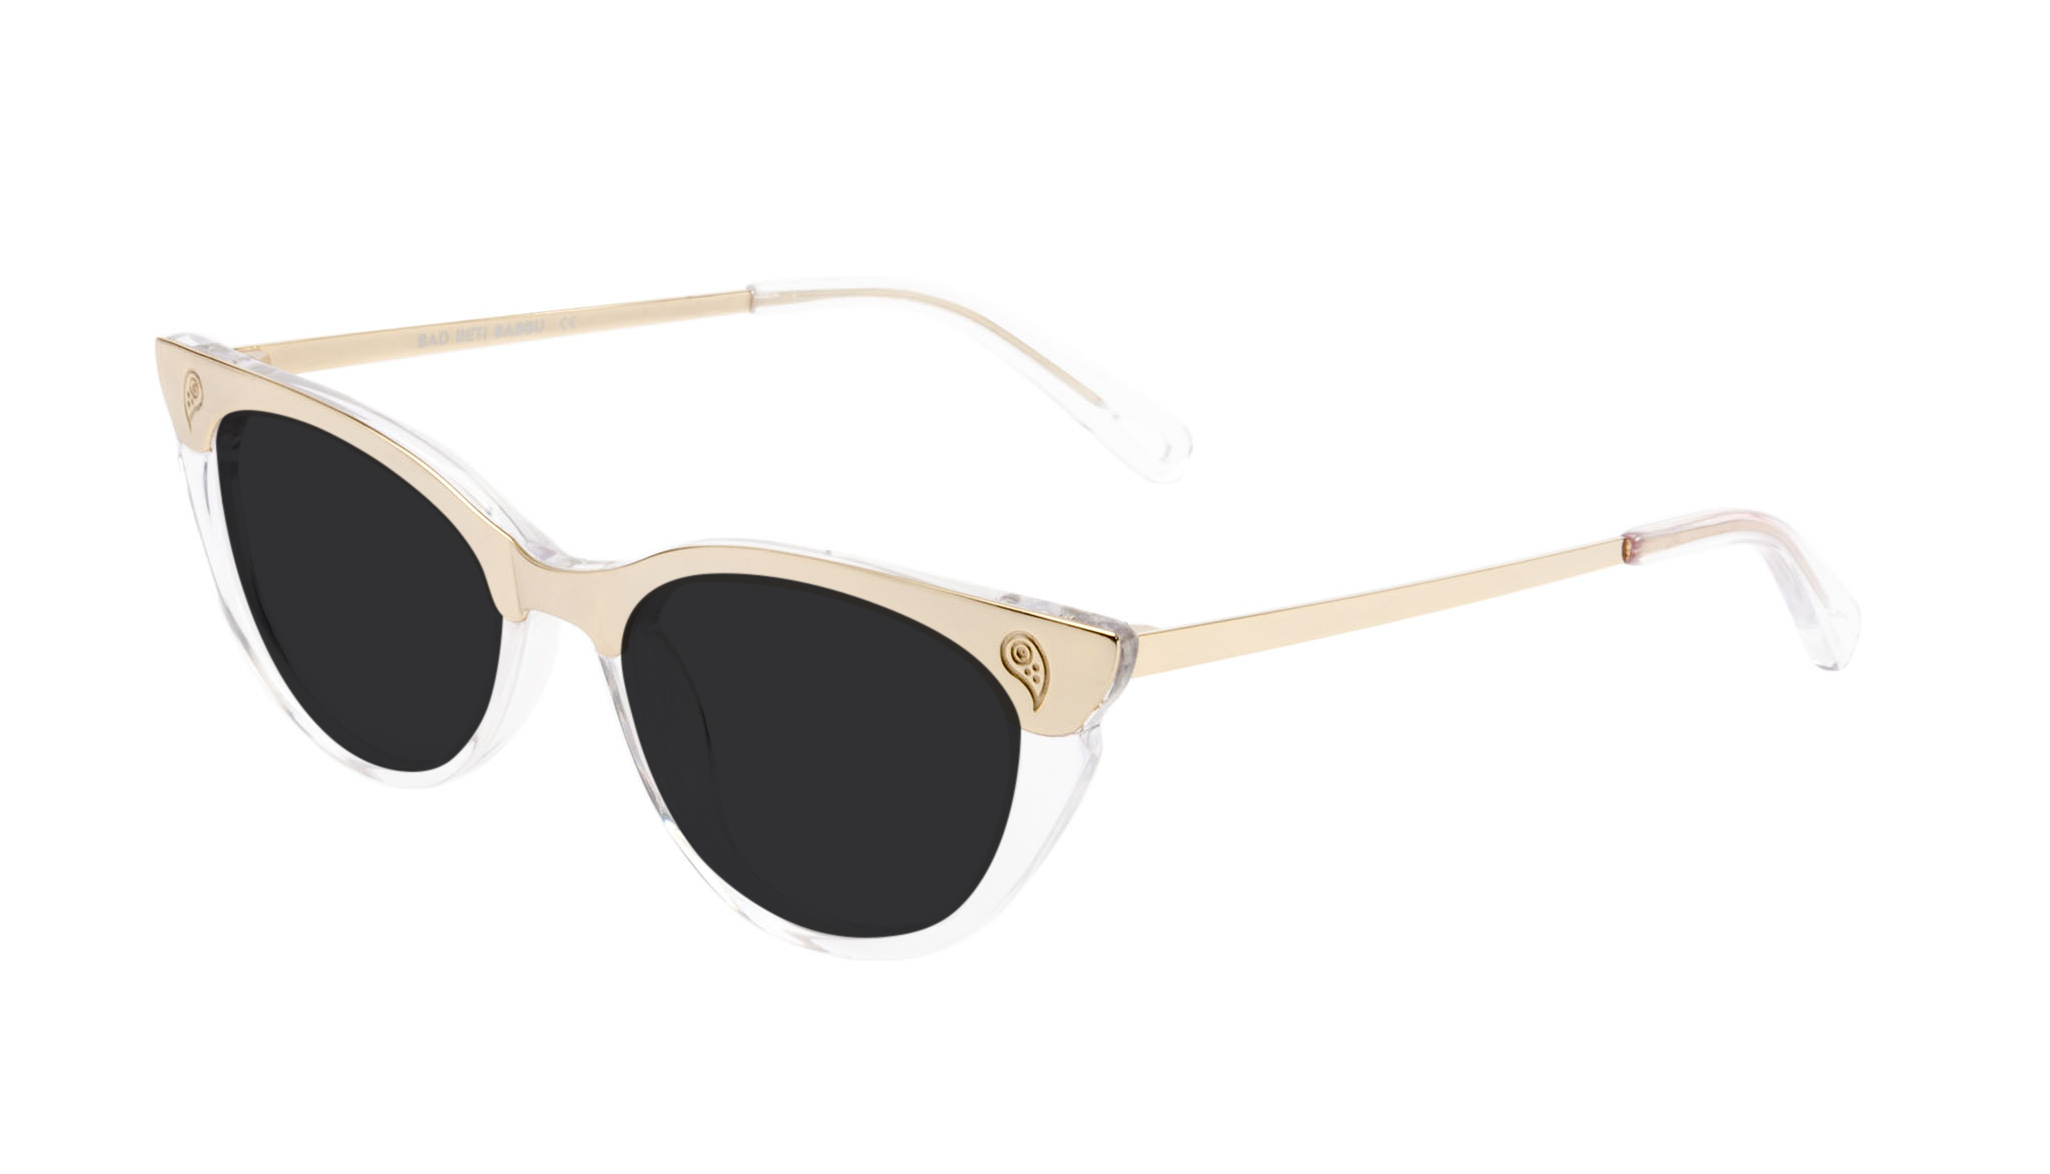 48570e1c24e2 Affordable fashion glasses cat eye daring cateye sunglasses women bad beti  babbu tilt jpg 1600x707 Bad